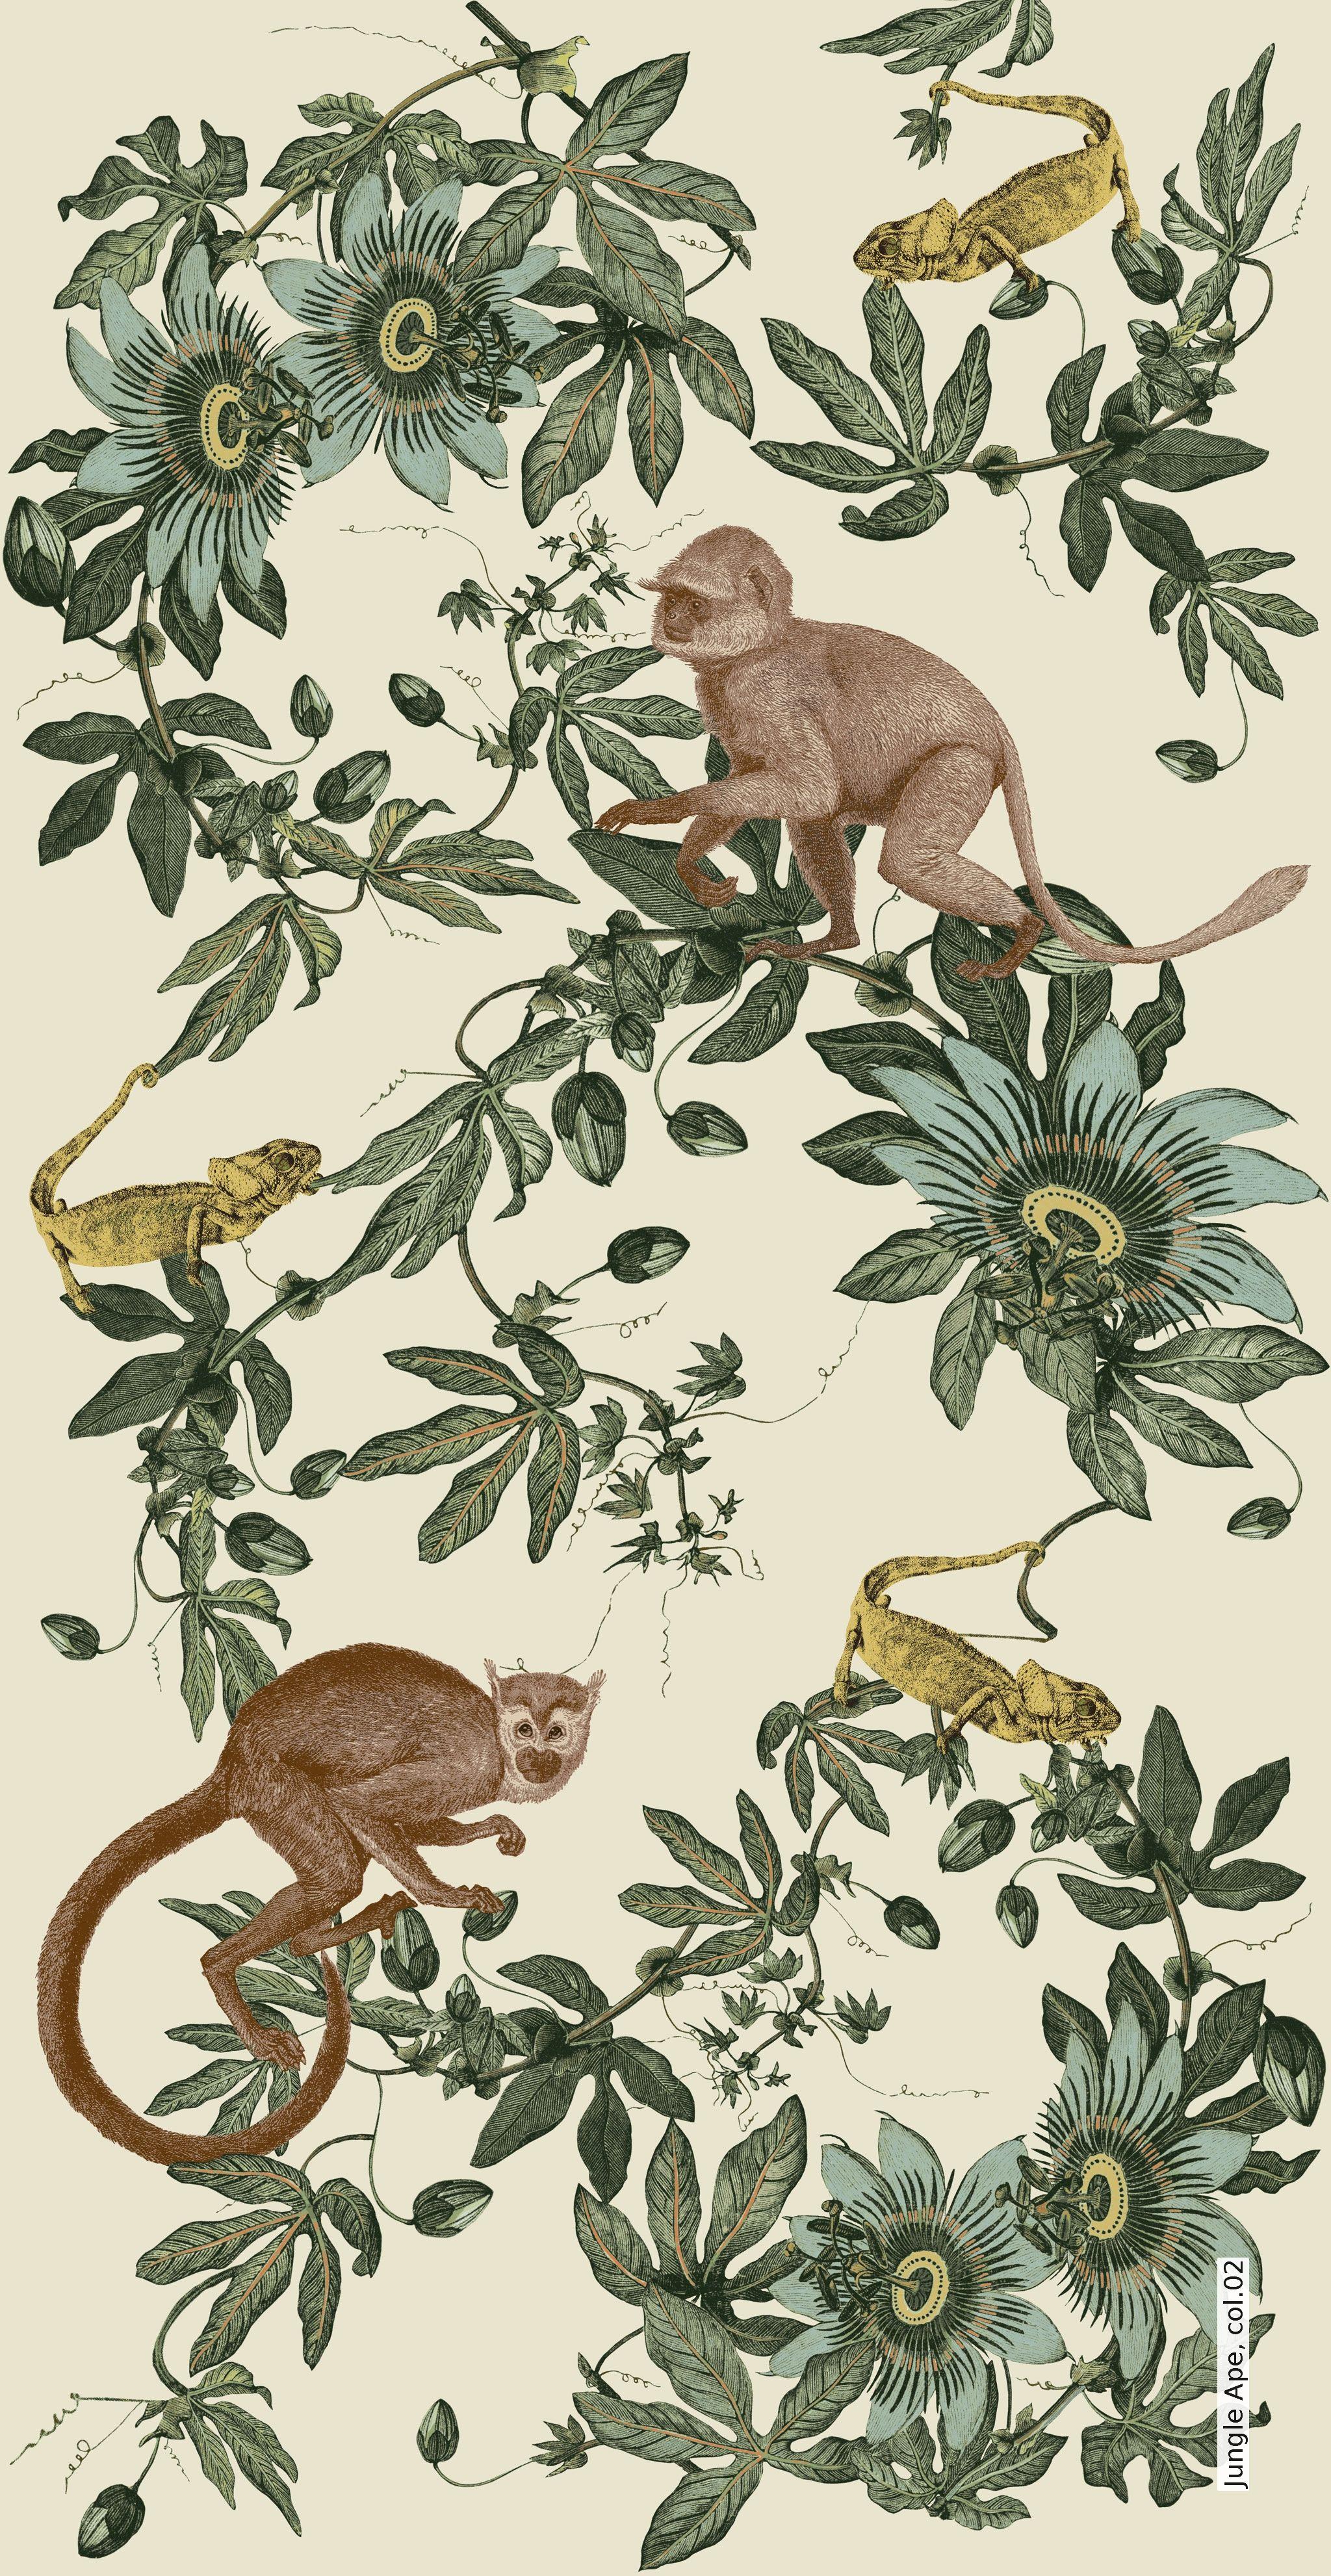 jungle ape fototapet pinterest dschungel dschungel tapete und tapeten. Black Bedroom Furniture Sets. Home Design Ideas